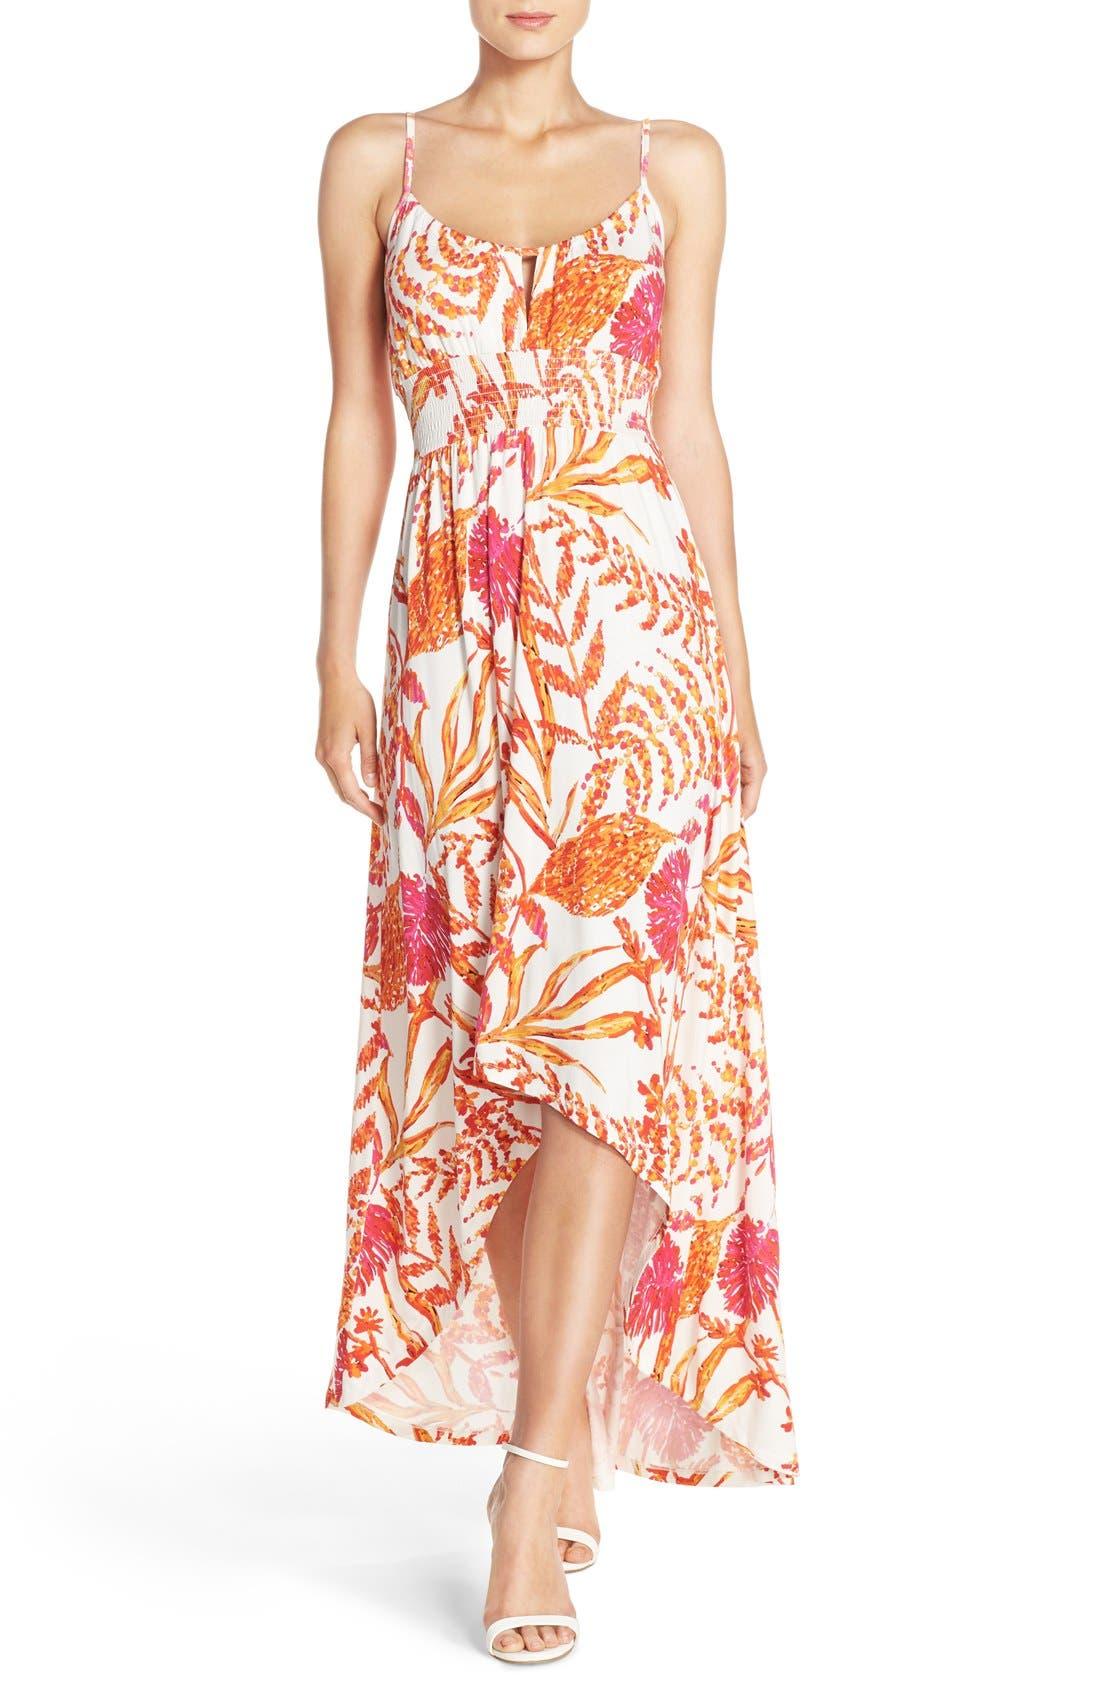 FELICITY & COCO Floral Print Maxi Dress